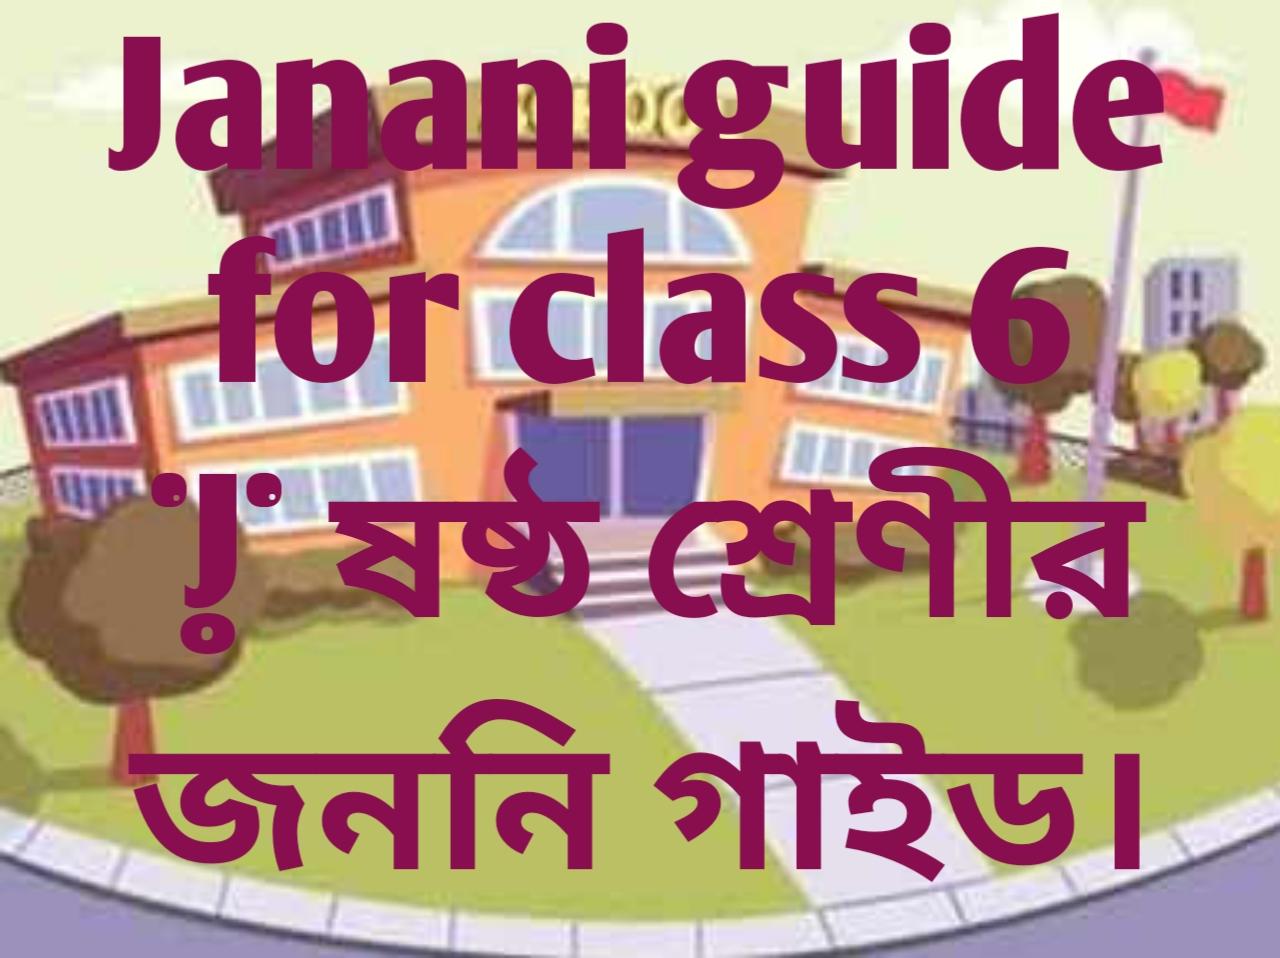 class 6 janani guide 2021, class 6 janani guide pdf, class 6 janani guide book 2021, class 6 math solution janani guide, janani guide class 6, janani guide for class 6, janani guide for class 6 english, janani guide for class 6 math, janani guide for class 6 science, janani guide for class 6 Bangladesh and global studies, janani guide for class 6, janani guide for class 6 hindu dharma, janani guide for class 6 ICT, janani guide for class 6 home science, janani guide for class 6 agriculture education, janani guide for class 6 physical education, ষষ্ট শ্রেণীর বাংলা গাইড জননী ডাউনলোড, ষষ্ট শ্রেণীর বাংলা গাইড এর পিডিএফ, ষষ্ট শ্রেণির বাংলা জননী গাইড পিডিএফ ২০২১, ষষ্ট শ্রেণীর জননী গাইড ২০২১, ষষ্ট শ্রেণির ইংরেজি জননী গাইড, ষষ্ট শ্রেণীর গণিত জননী গাইড, ষষ্ট শ্রেণীর জননী গাইড বিজ্ঞান, ষষ্ট শ্রেণীর জননী গাইড বাংলাদেশ ও বিশ্বপরিচয়, ষষ্ট শ্রেণীর জননী গাইড ইসলাম শিক্ষা, ষষ্ট শ্রেণীর জননী গাইড হিন্দুধর্ম, ষষ্ট শ্রেণীর জননী গাইড গার্হস্থ্য বিজ্ঞান, ষষ্ট শ্রেণীর জননী গাইড কৃষি শিক্ষা, ষষ্ট শ্রেণীর জননী গাইড তথ্য যোগাযোগ প্রযুক্তি, ষষ্ট শ্রেণীর জননী গাইড শারীরিক শিক্ষা,